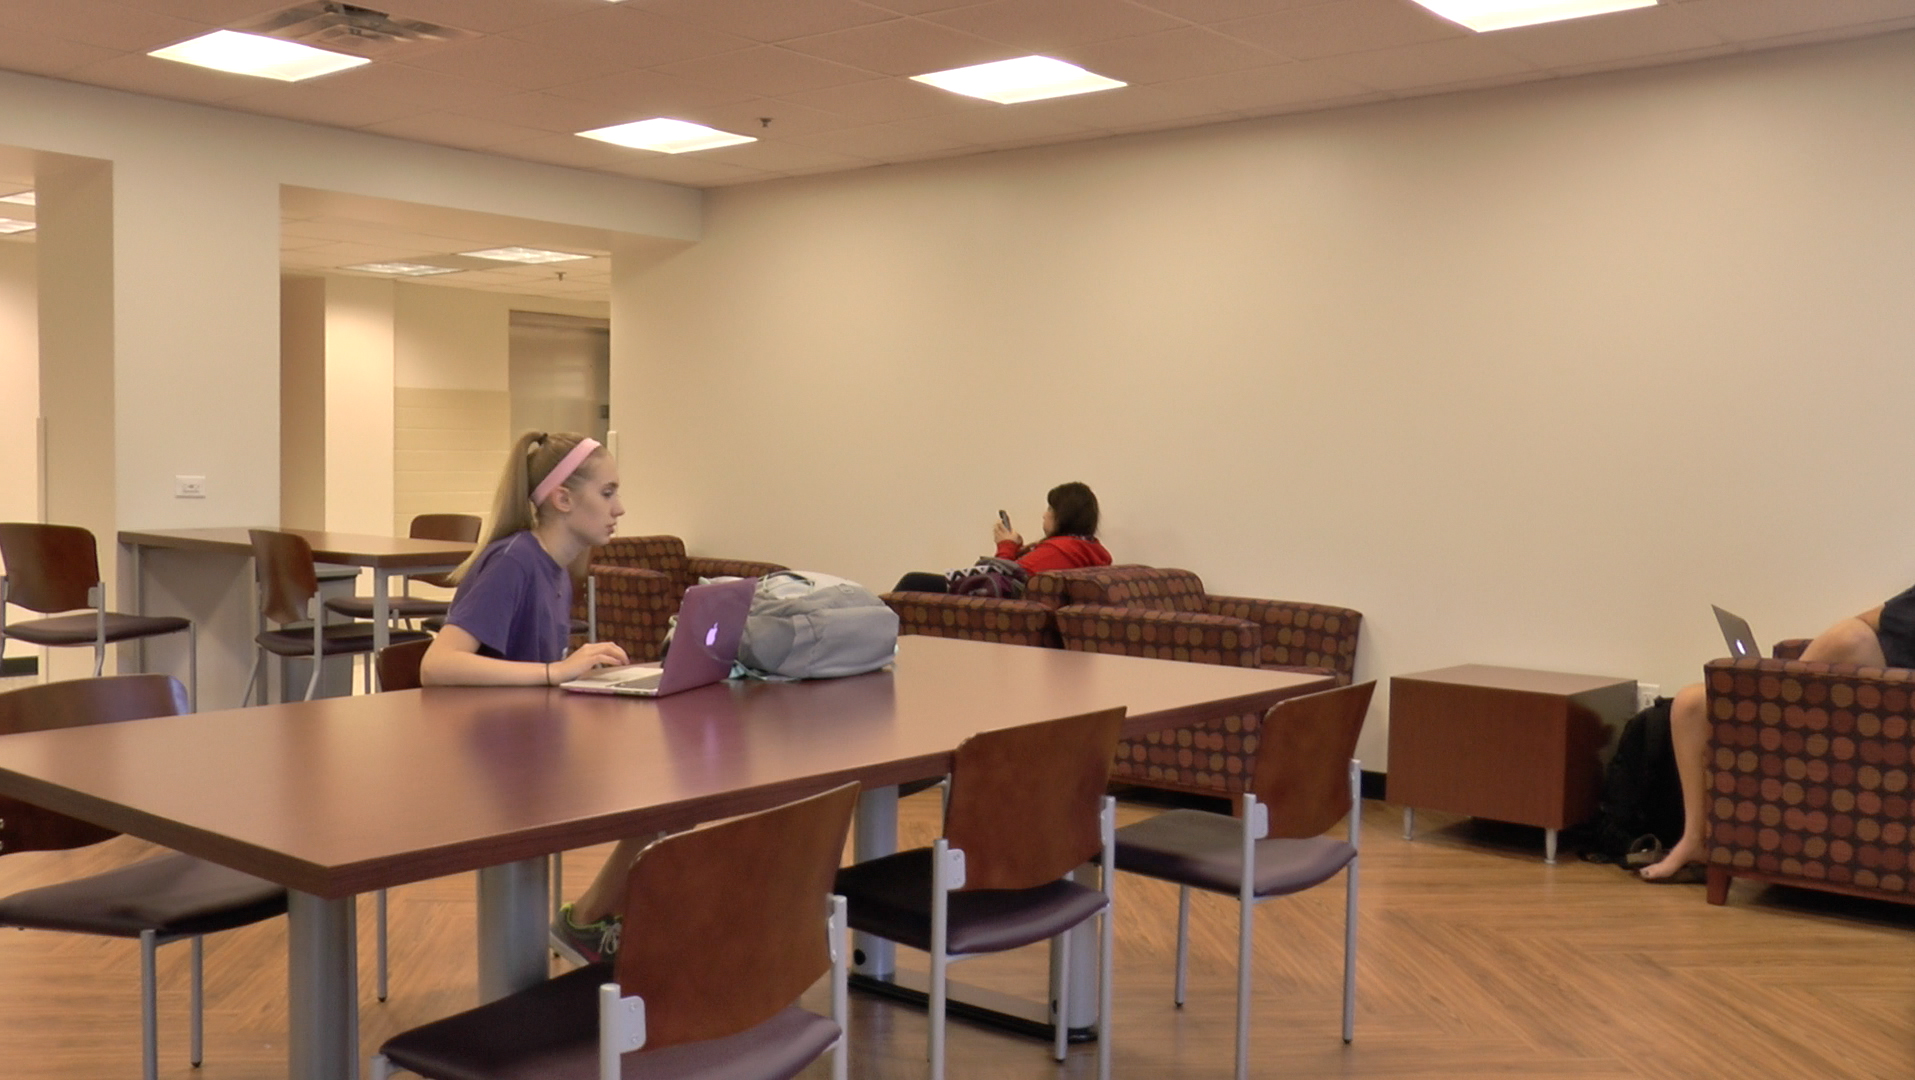 Students respond positively to Winton-Scott renovation